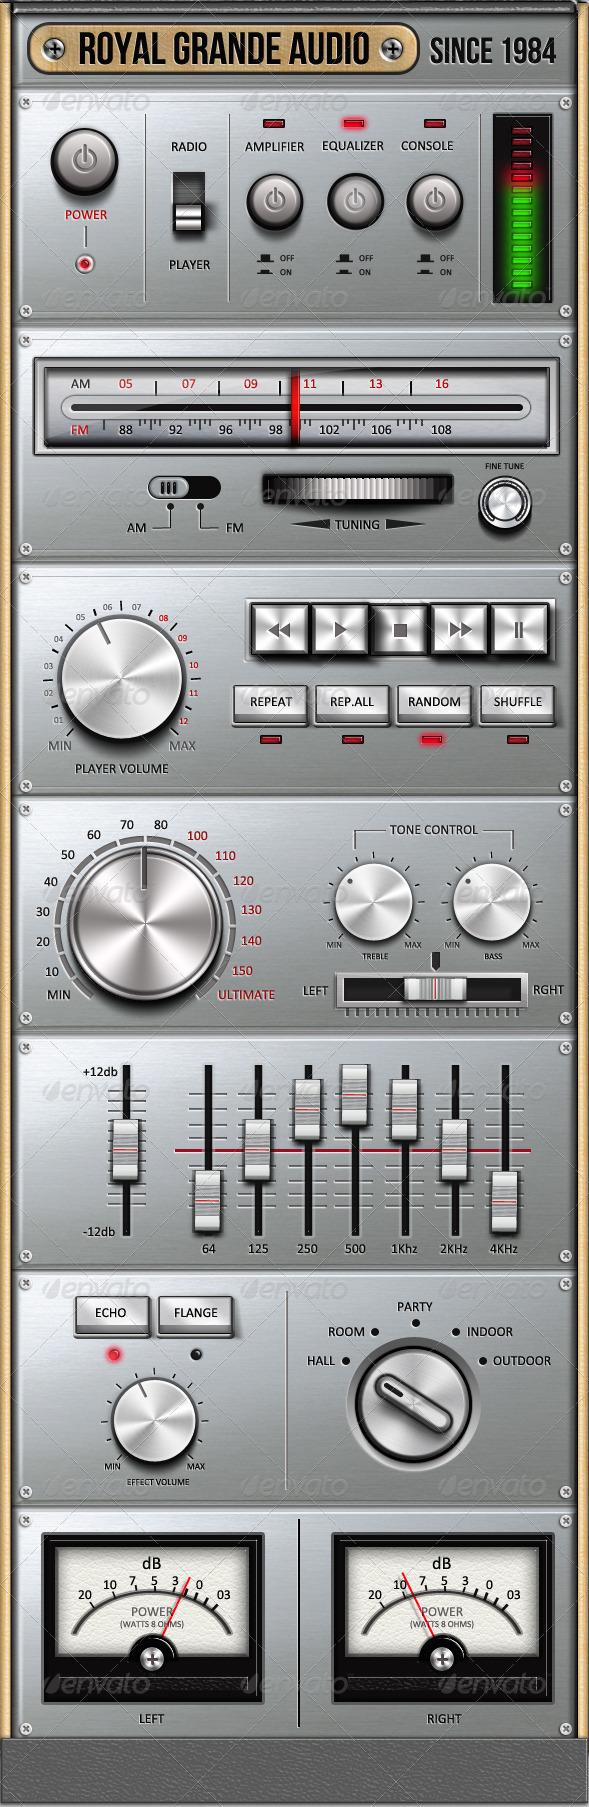 GraphicRiver Royal Grande Very Old Audio Set UI 2379380